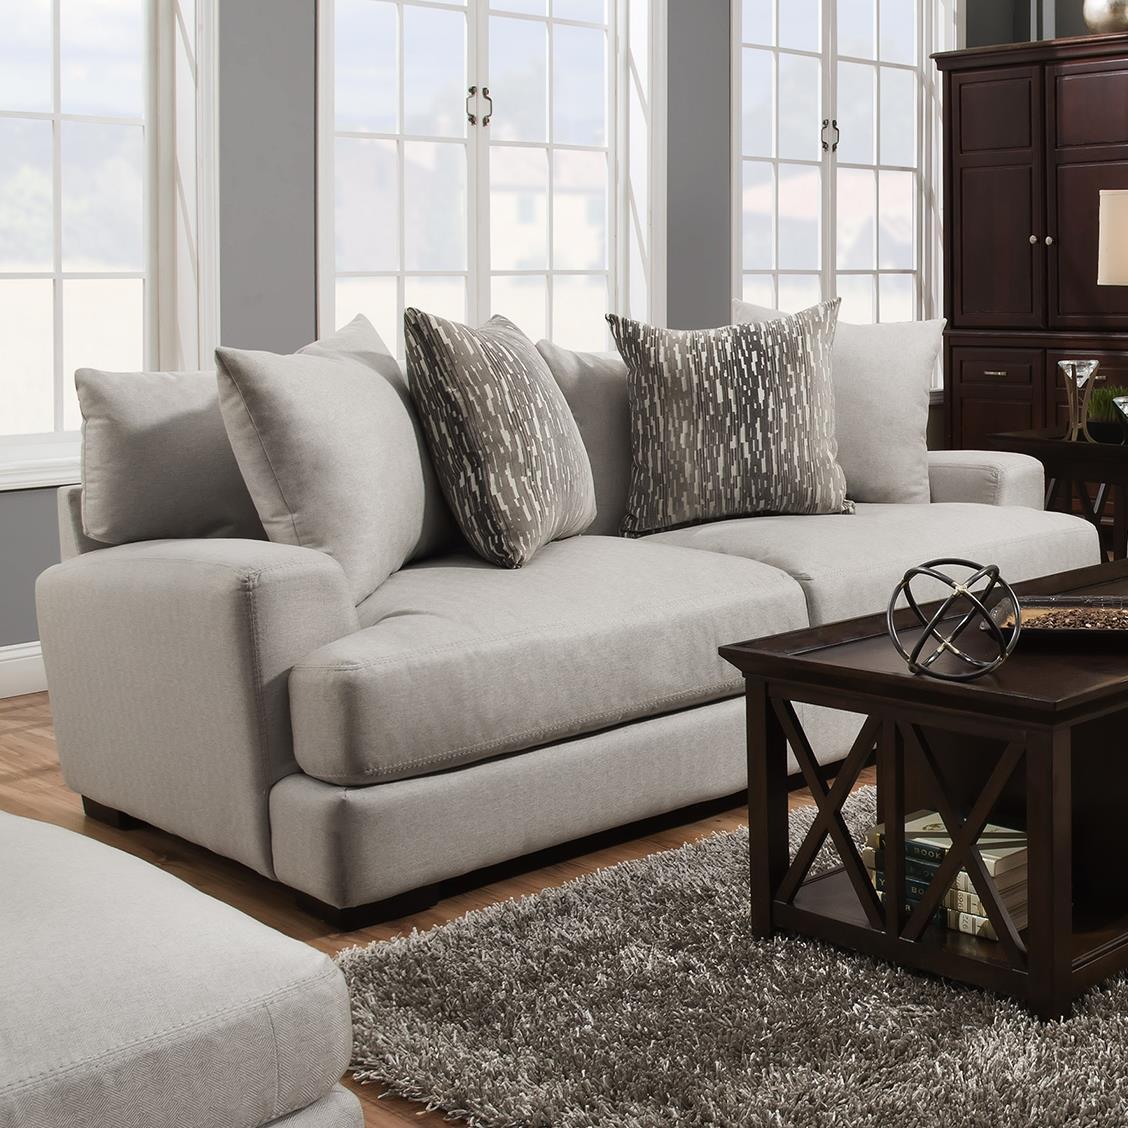 Oslo Sofa by Franklin at Wilcox Furniture